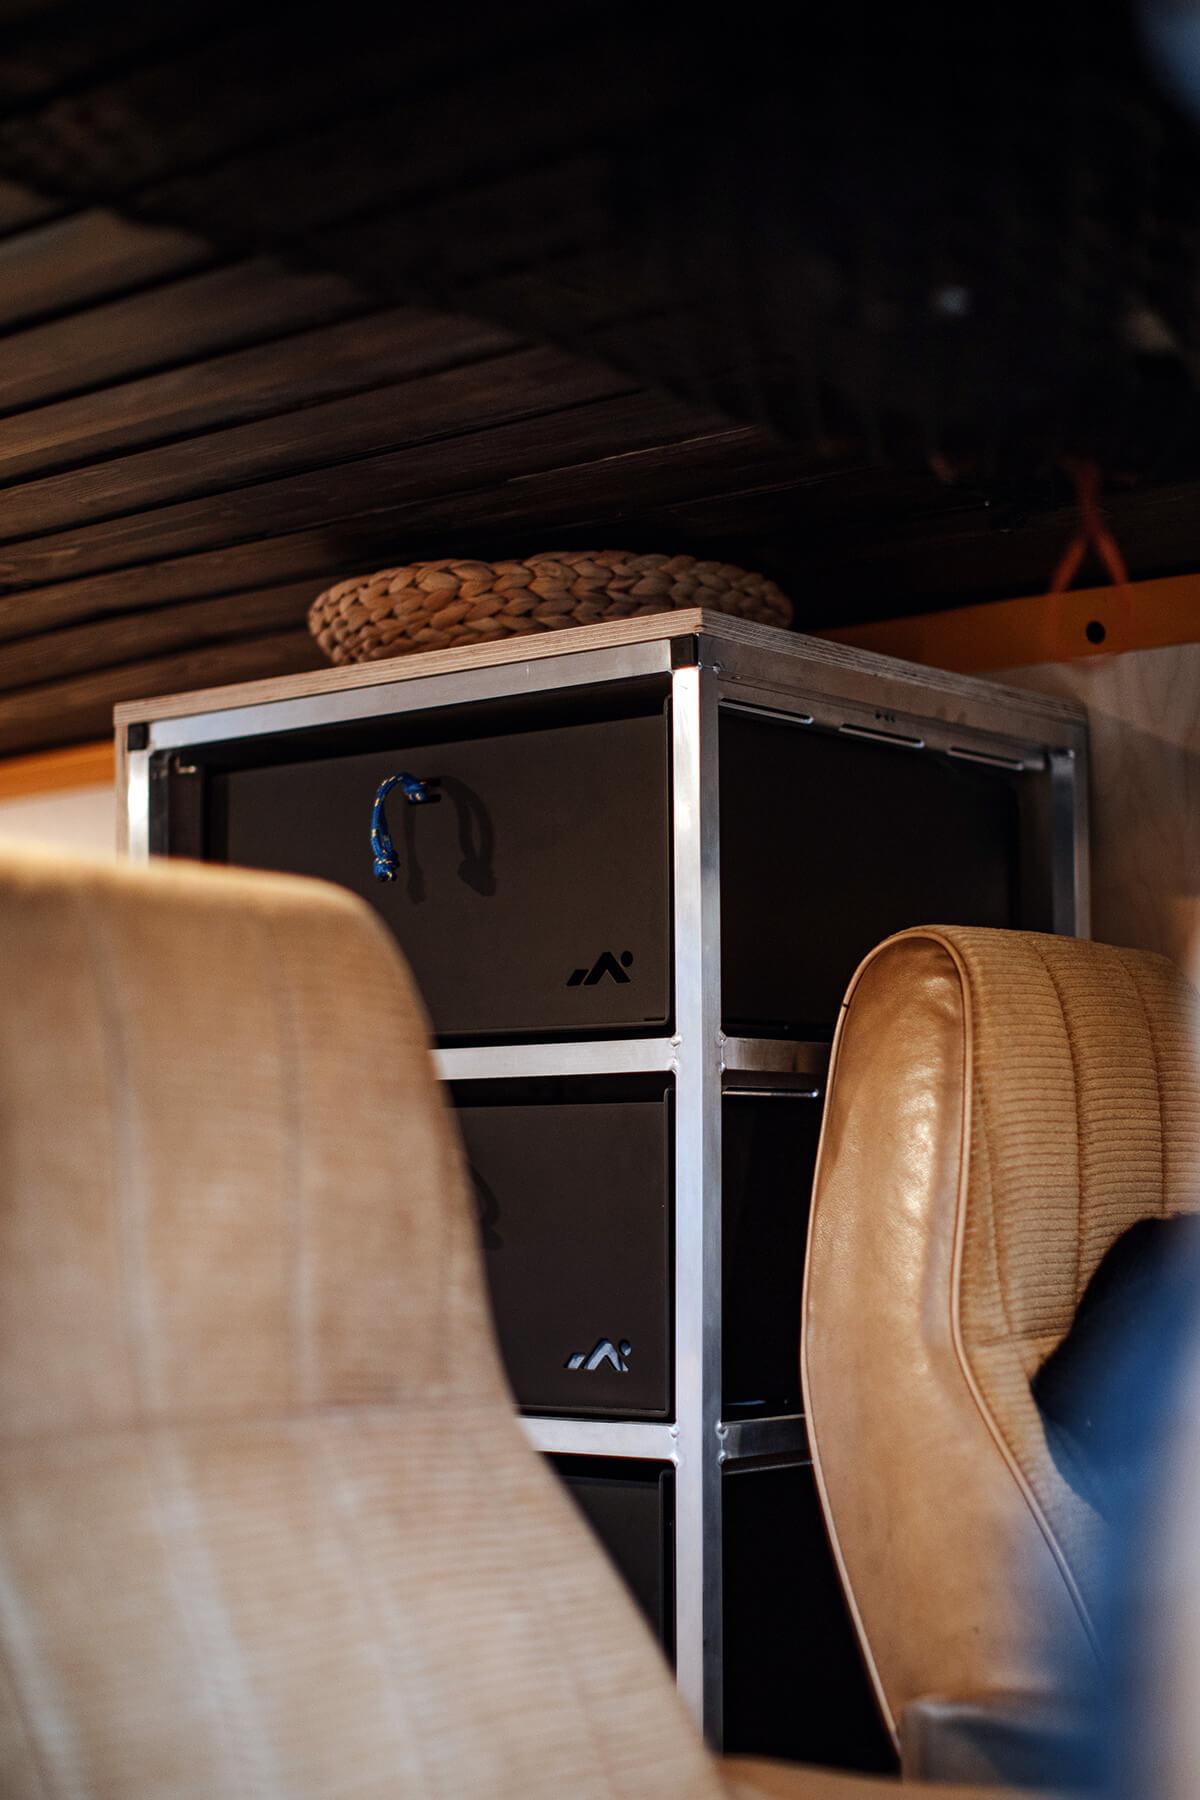 Custom drawers setup for van life